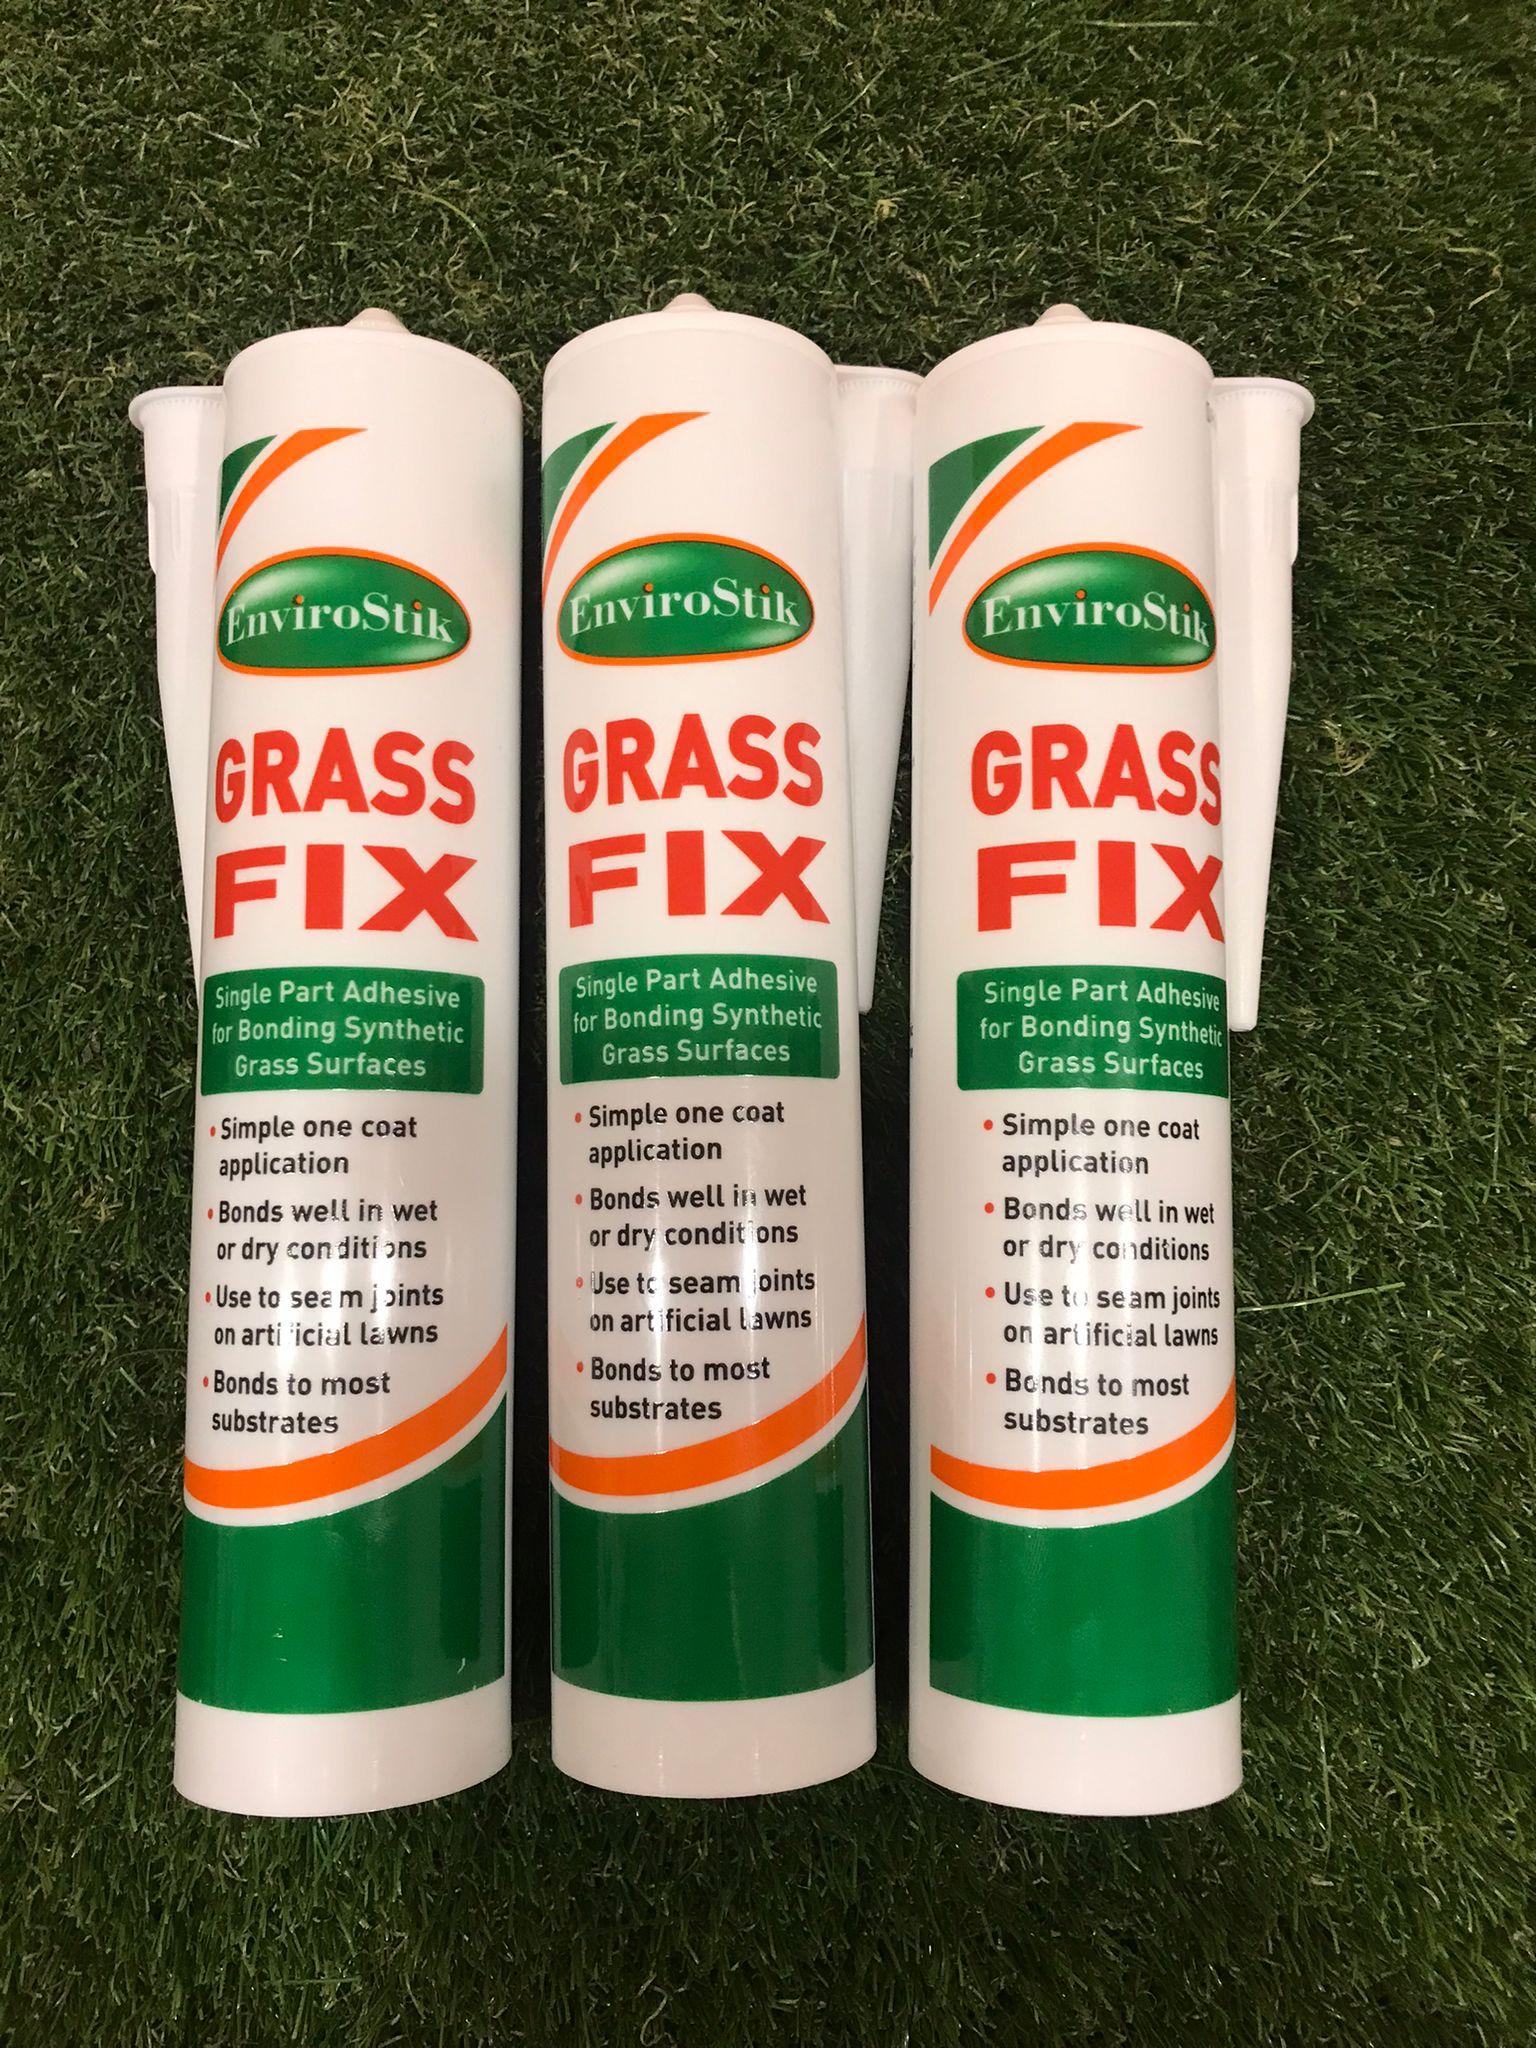 3 x Envirostik Grass Fix 310ml Adhesive